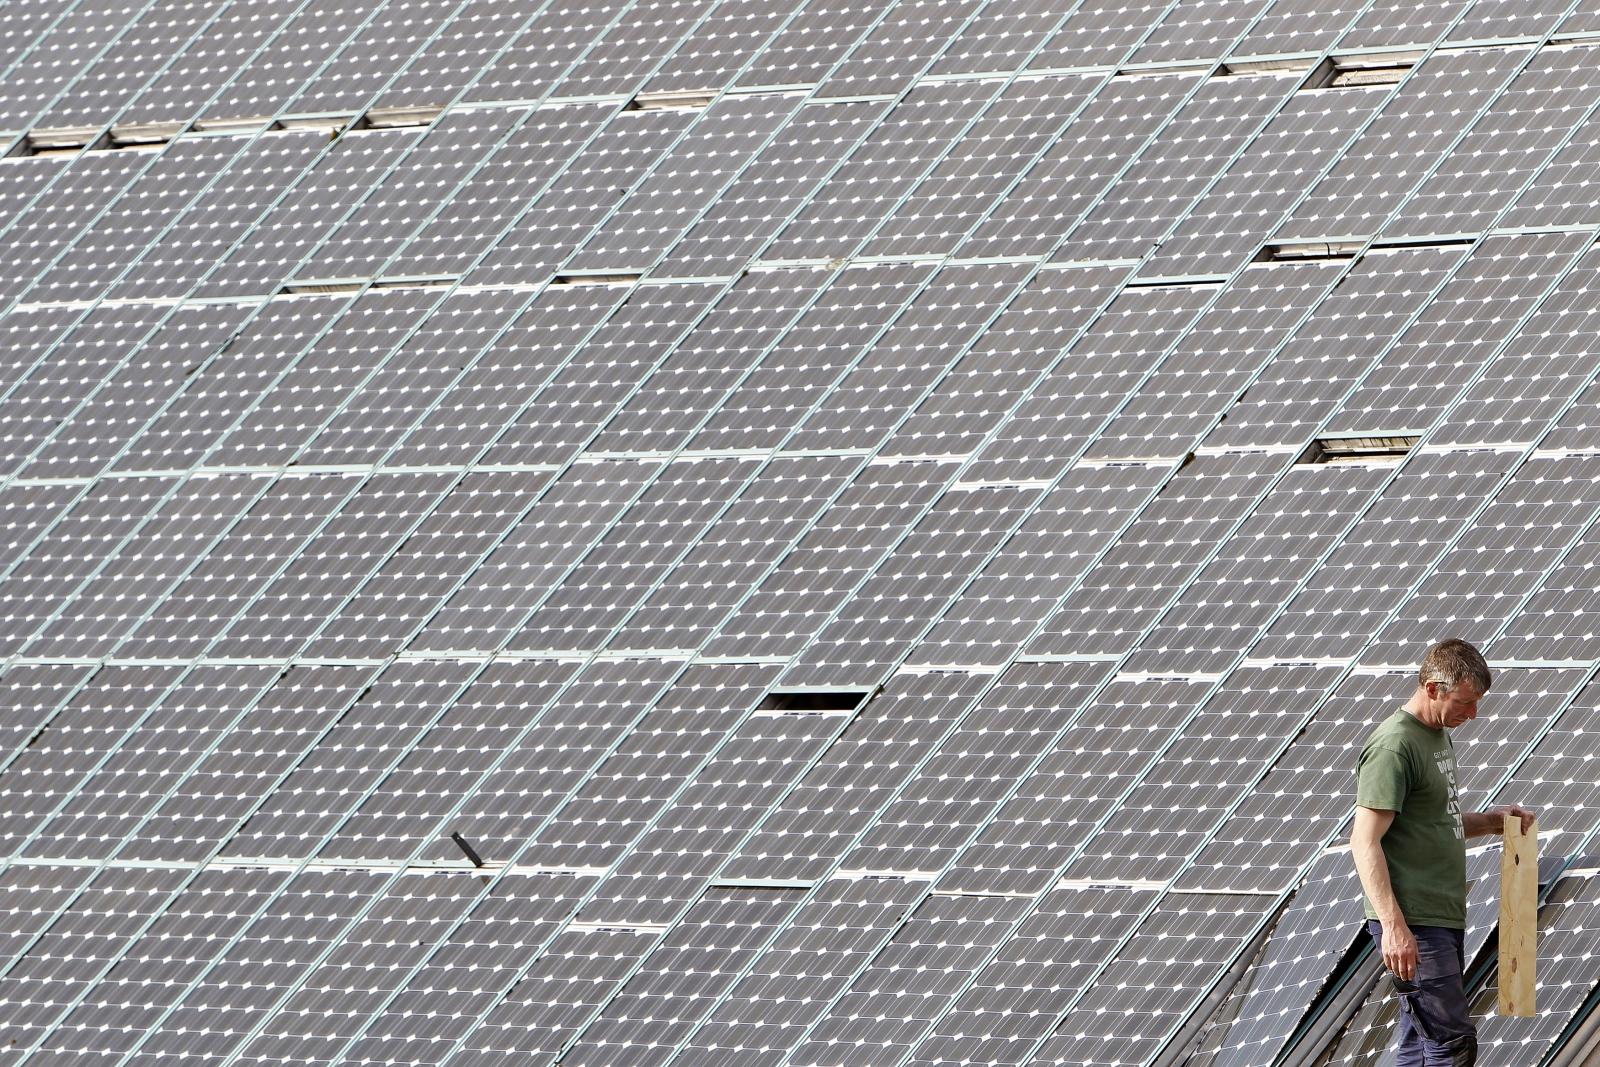 A man works on solar panels